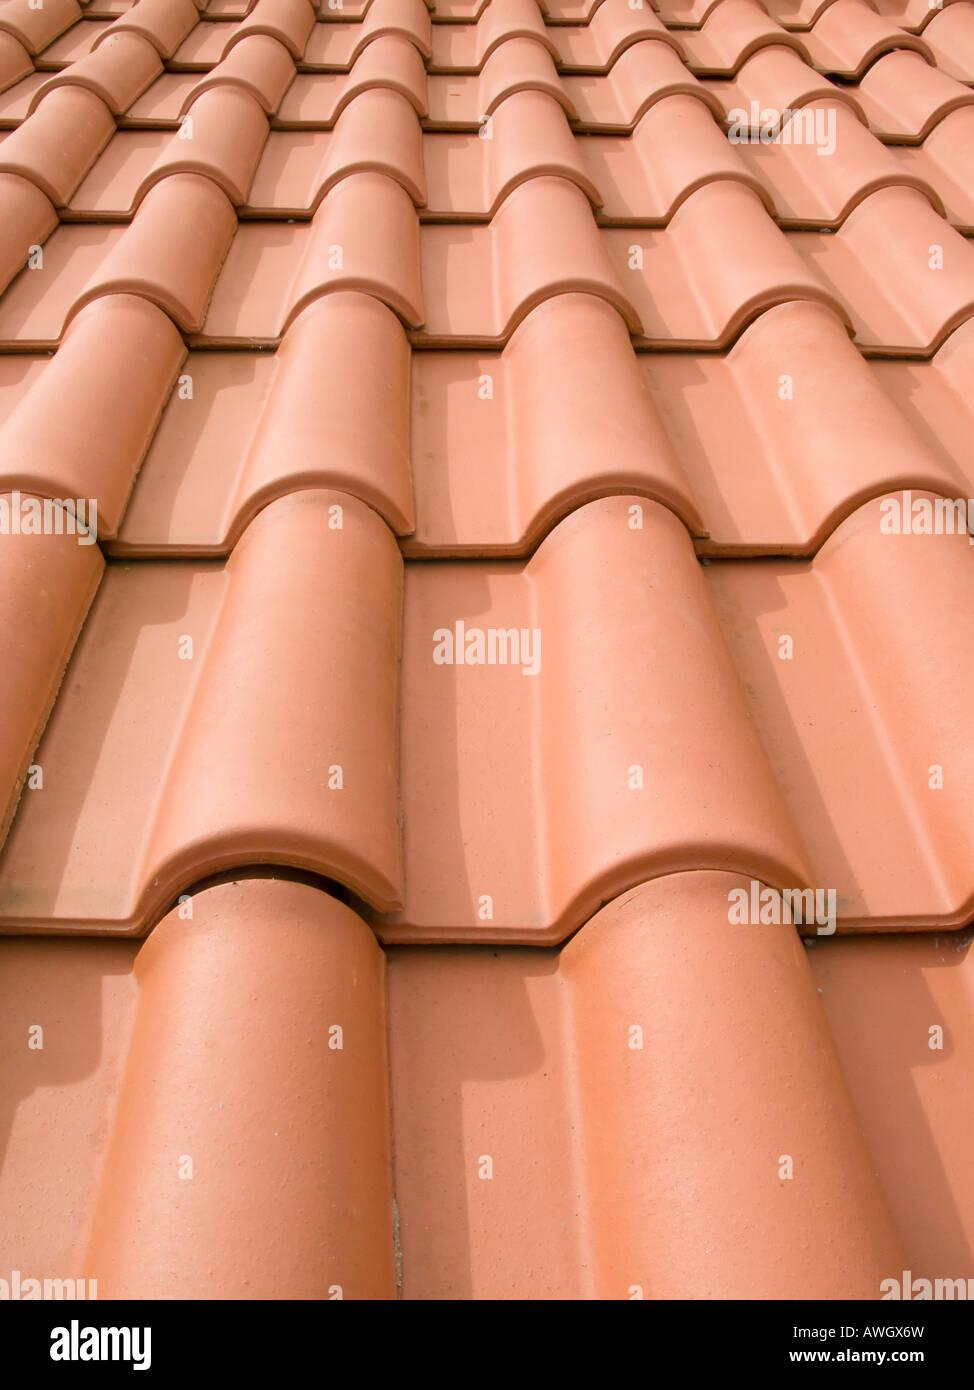 Neue orange Dachziegel hautnah in Portugal Stockbild